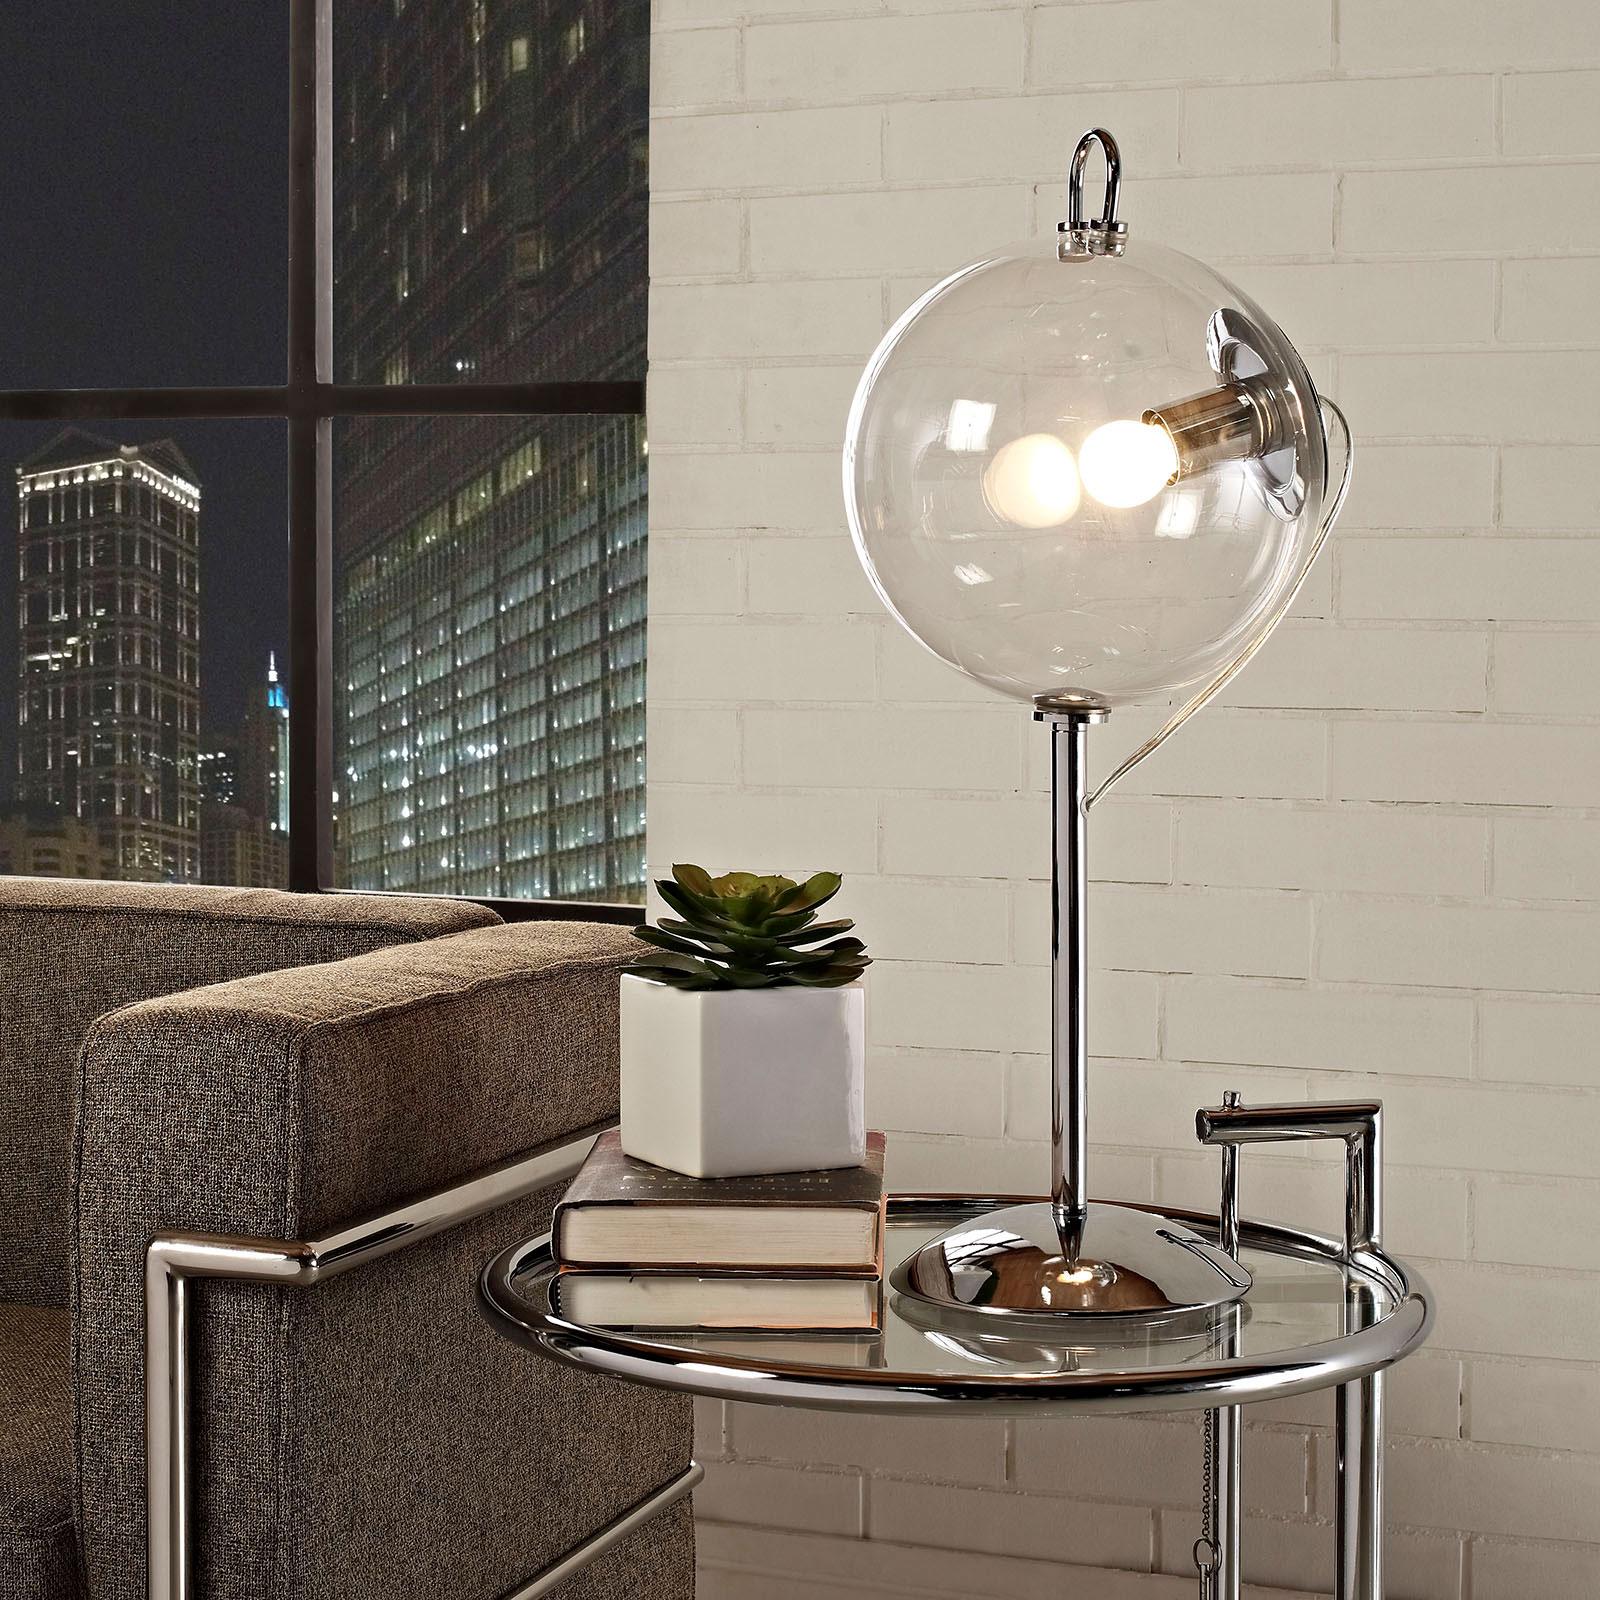 4qFCEo63Dh_Orb_Table_Lamp3